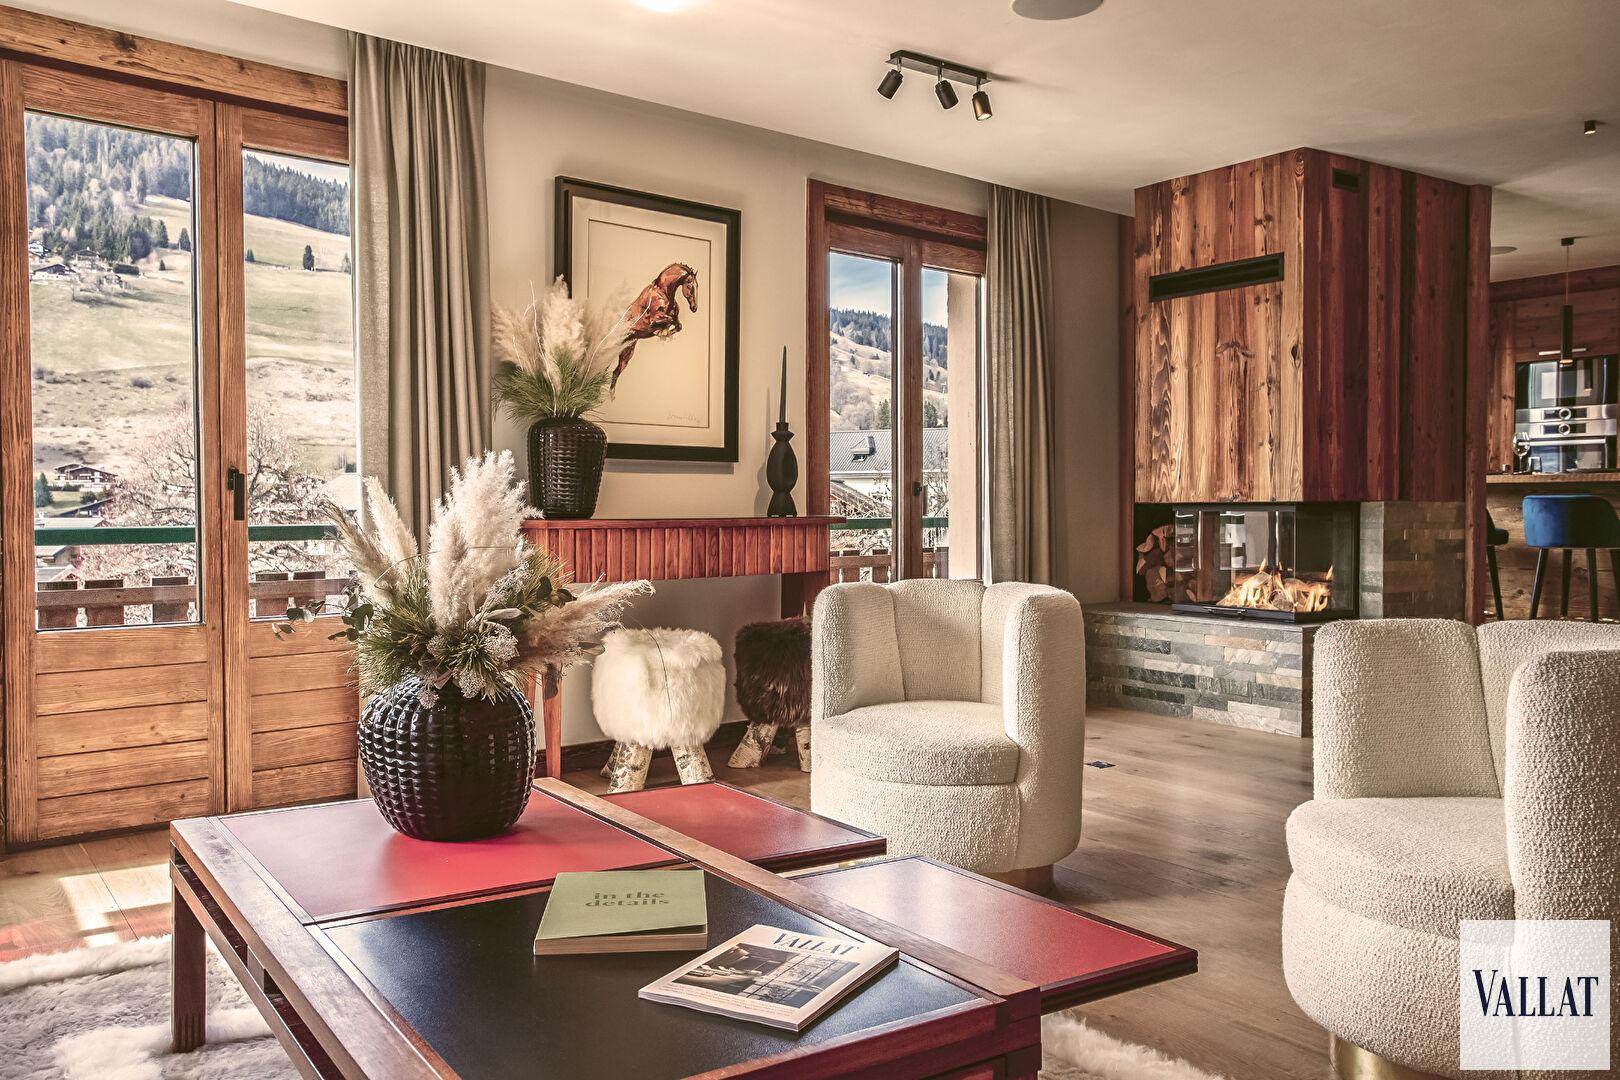 4 room apartment Megève - Village Accommodation in Megeve